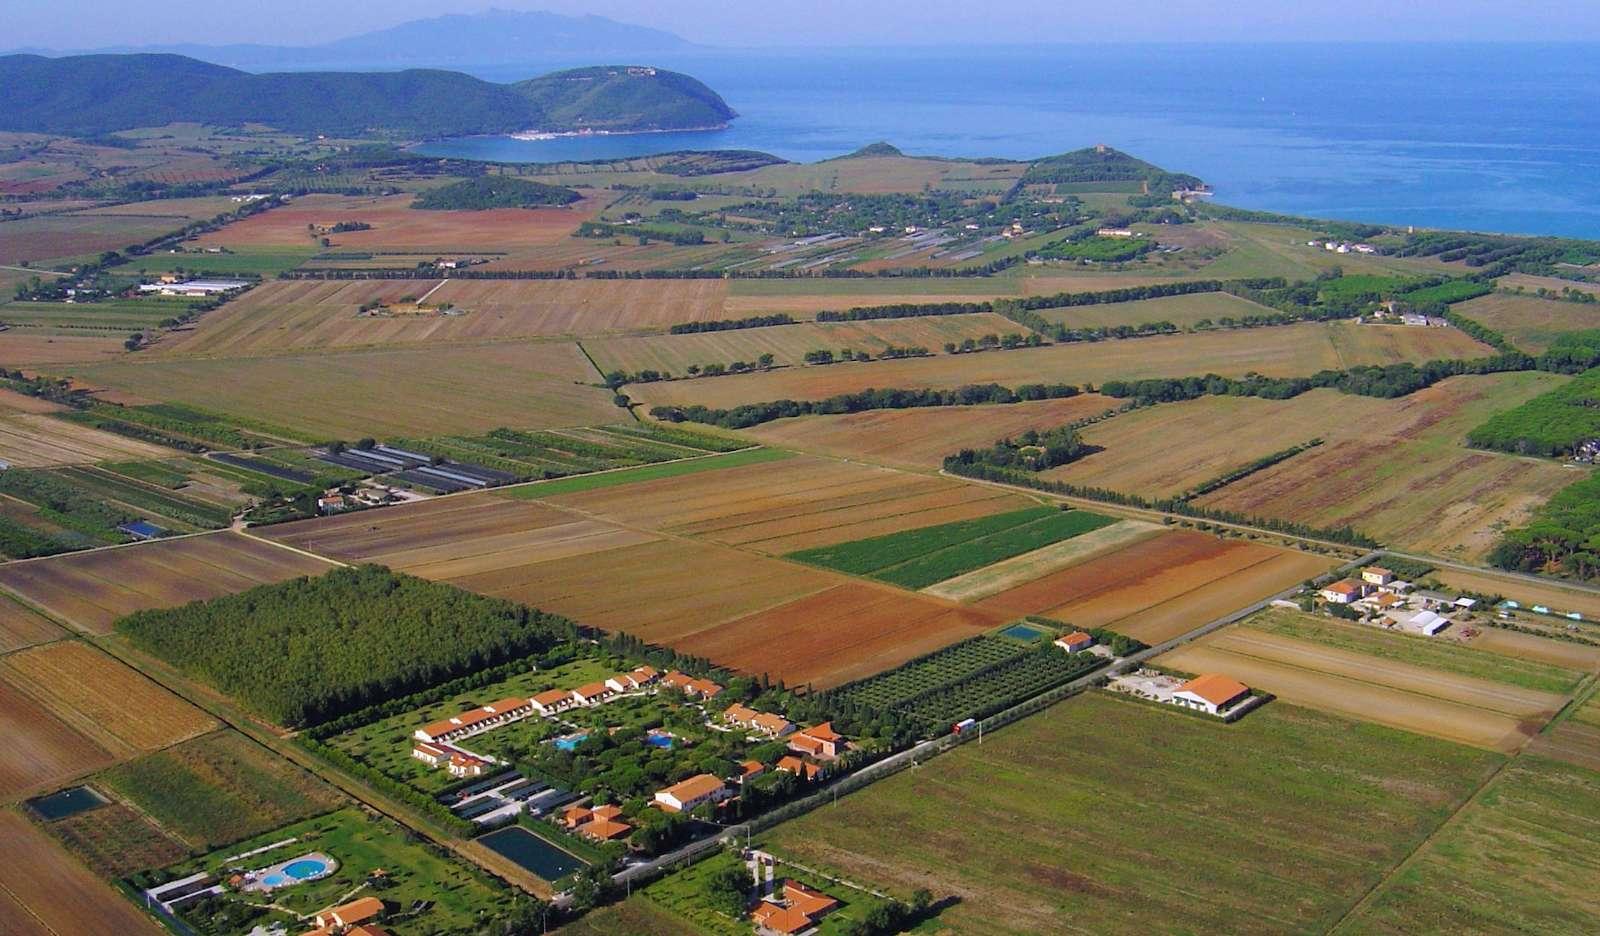 Luftaufnahme der Umgebung Ghiacci Vecchi